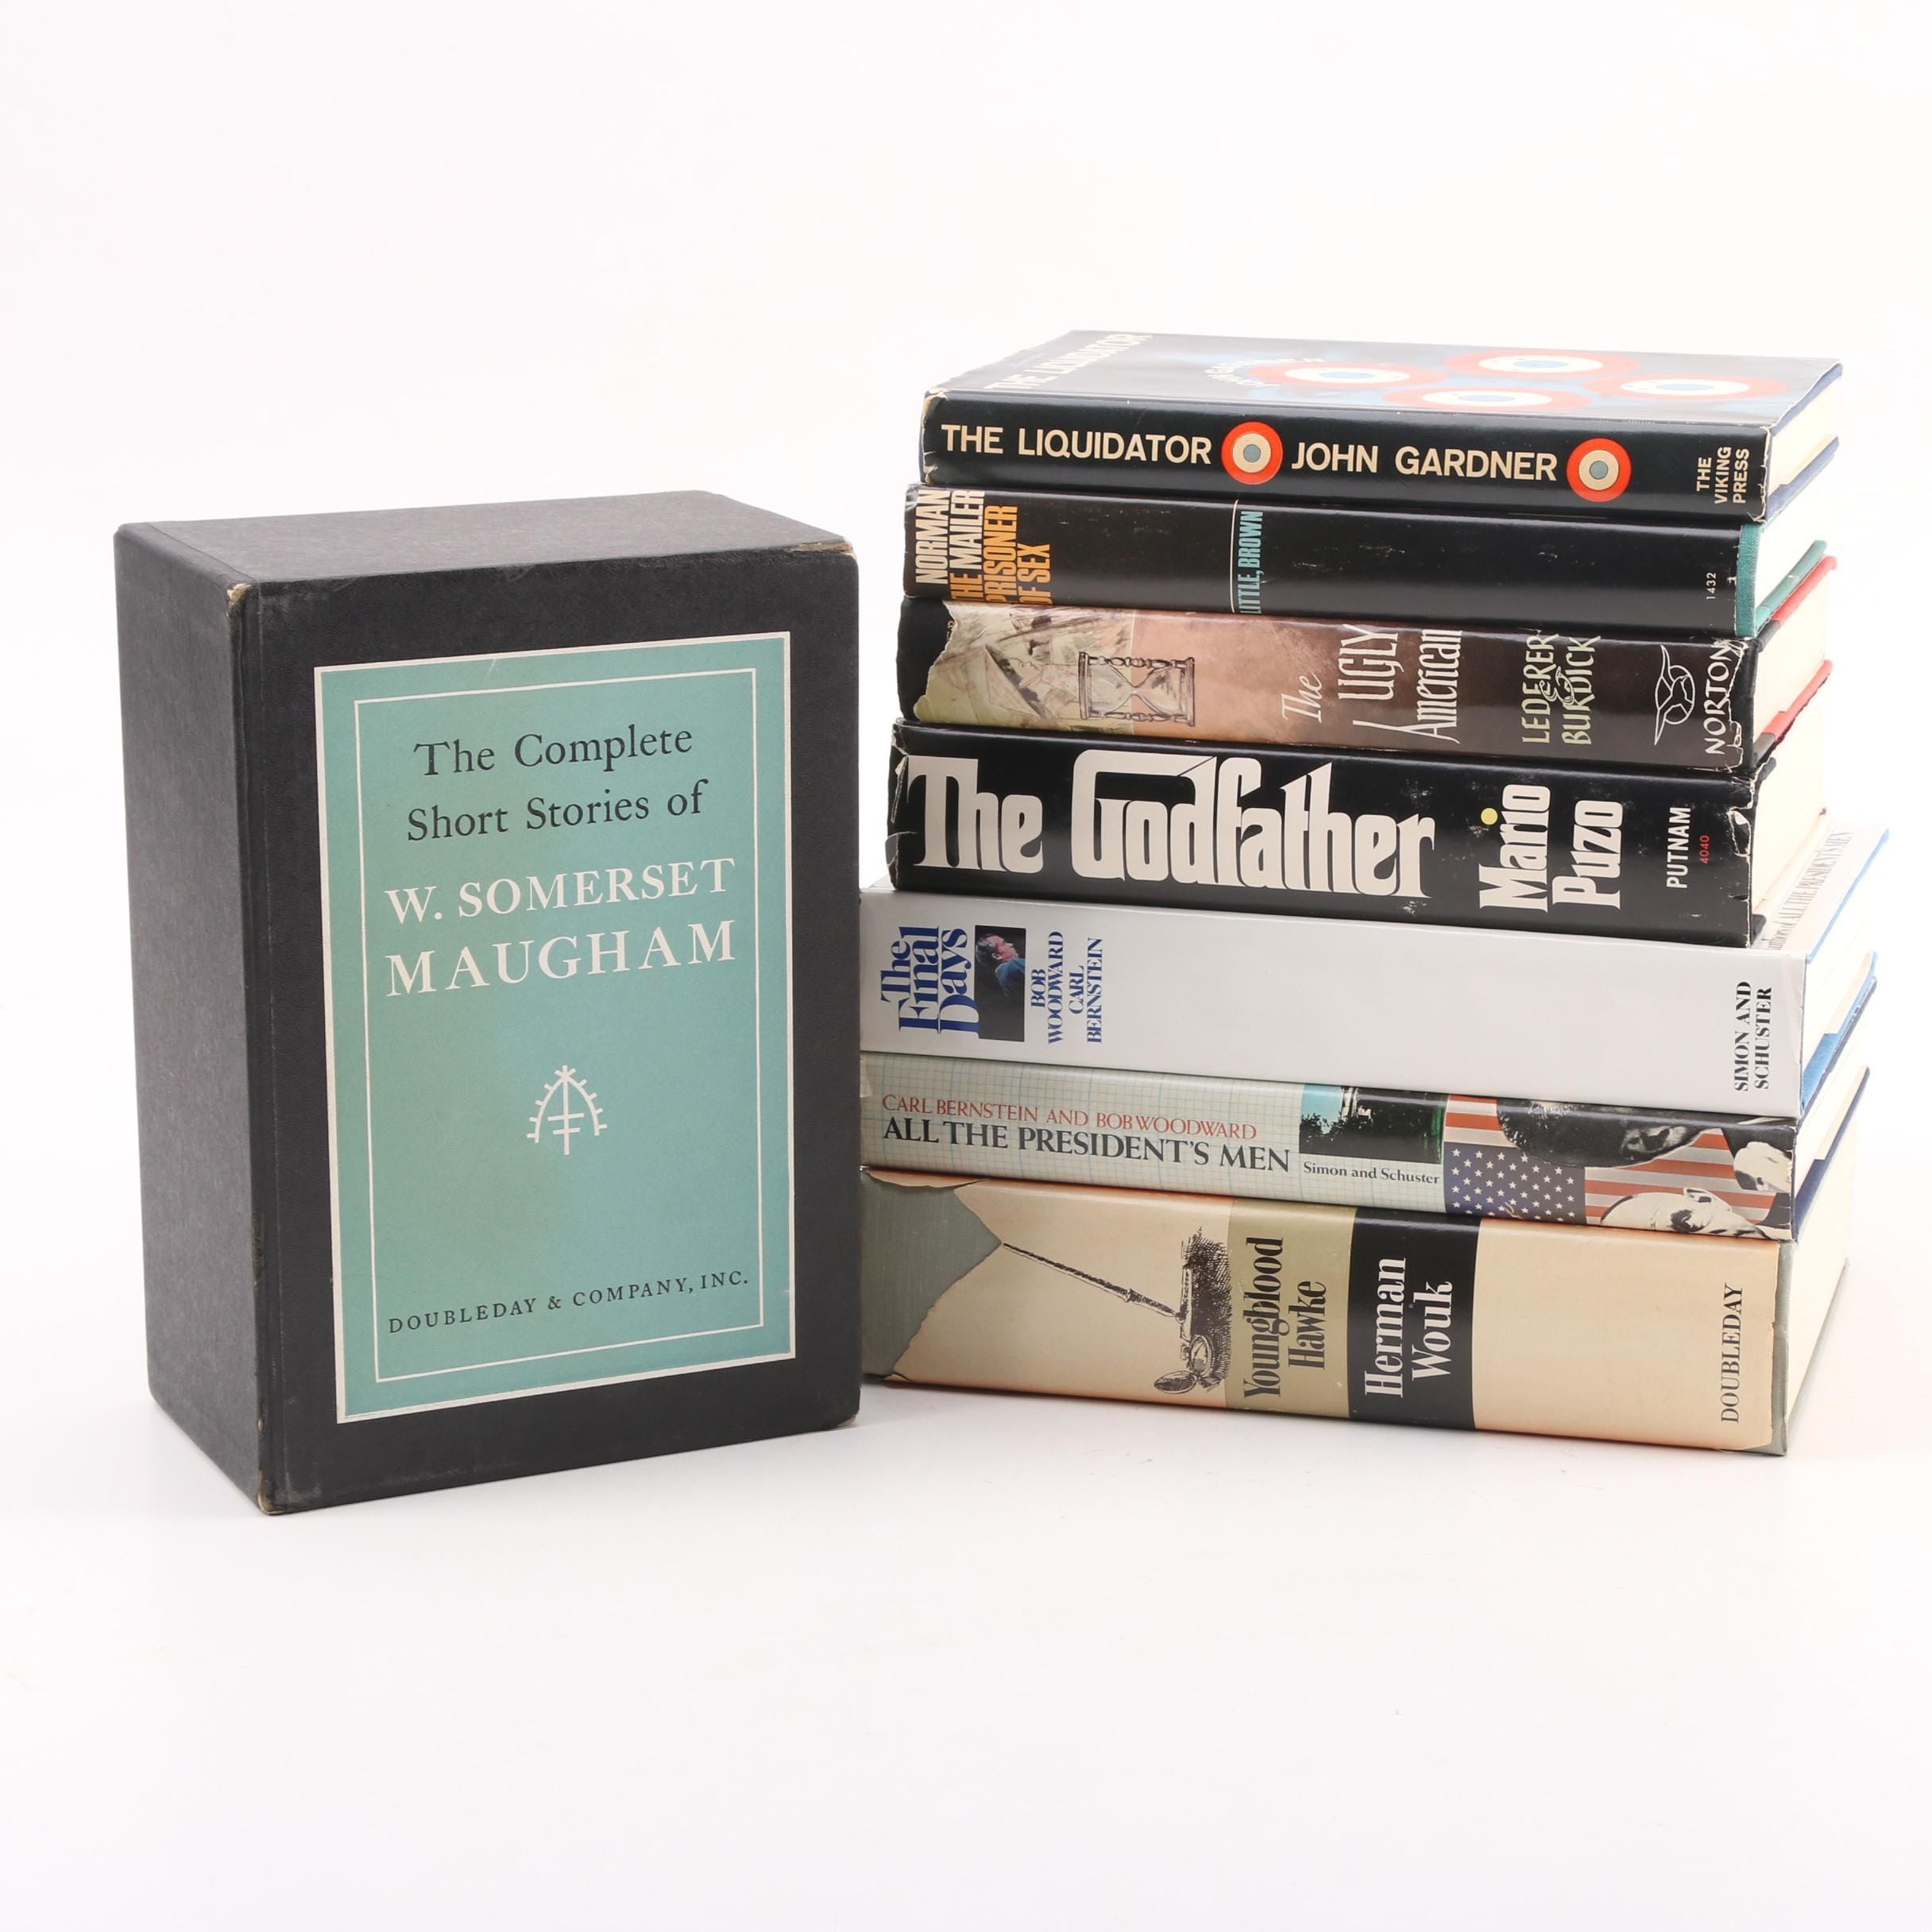 Vintage Books by Bob Woodward, Norman Mailer, John Gardner, and More